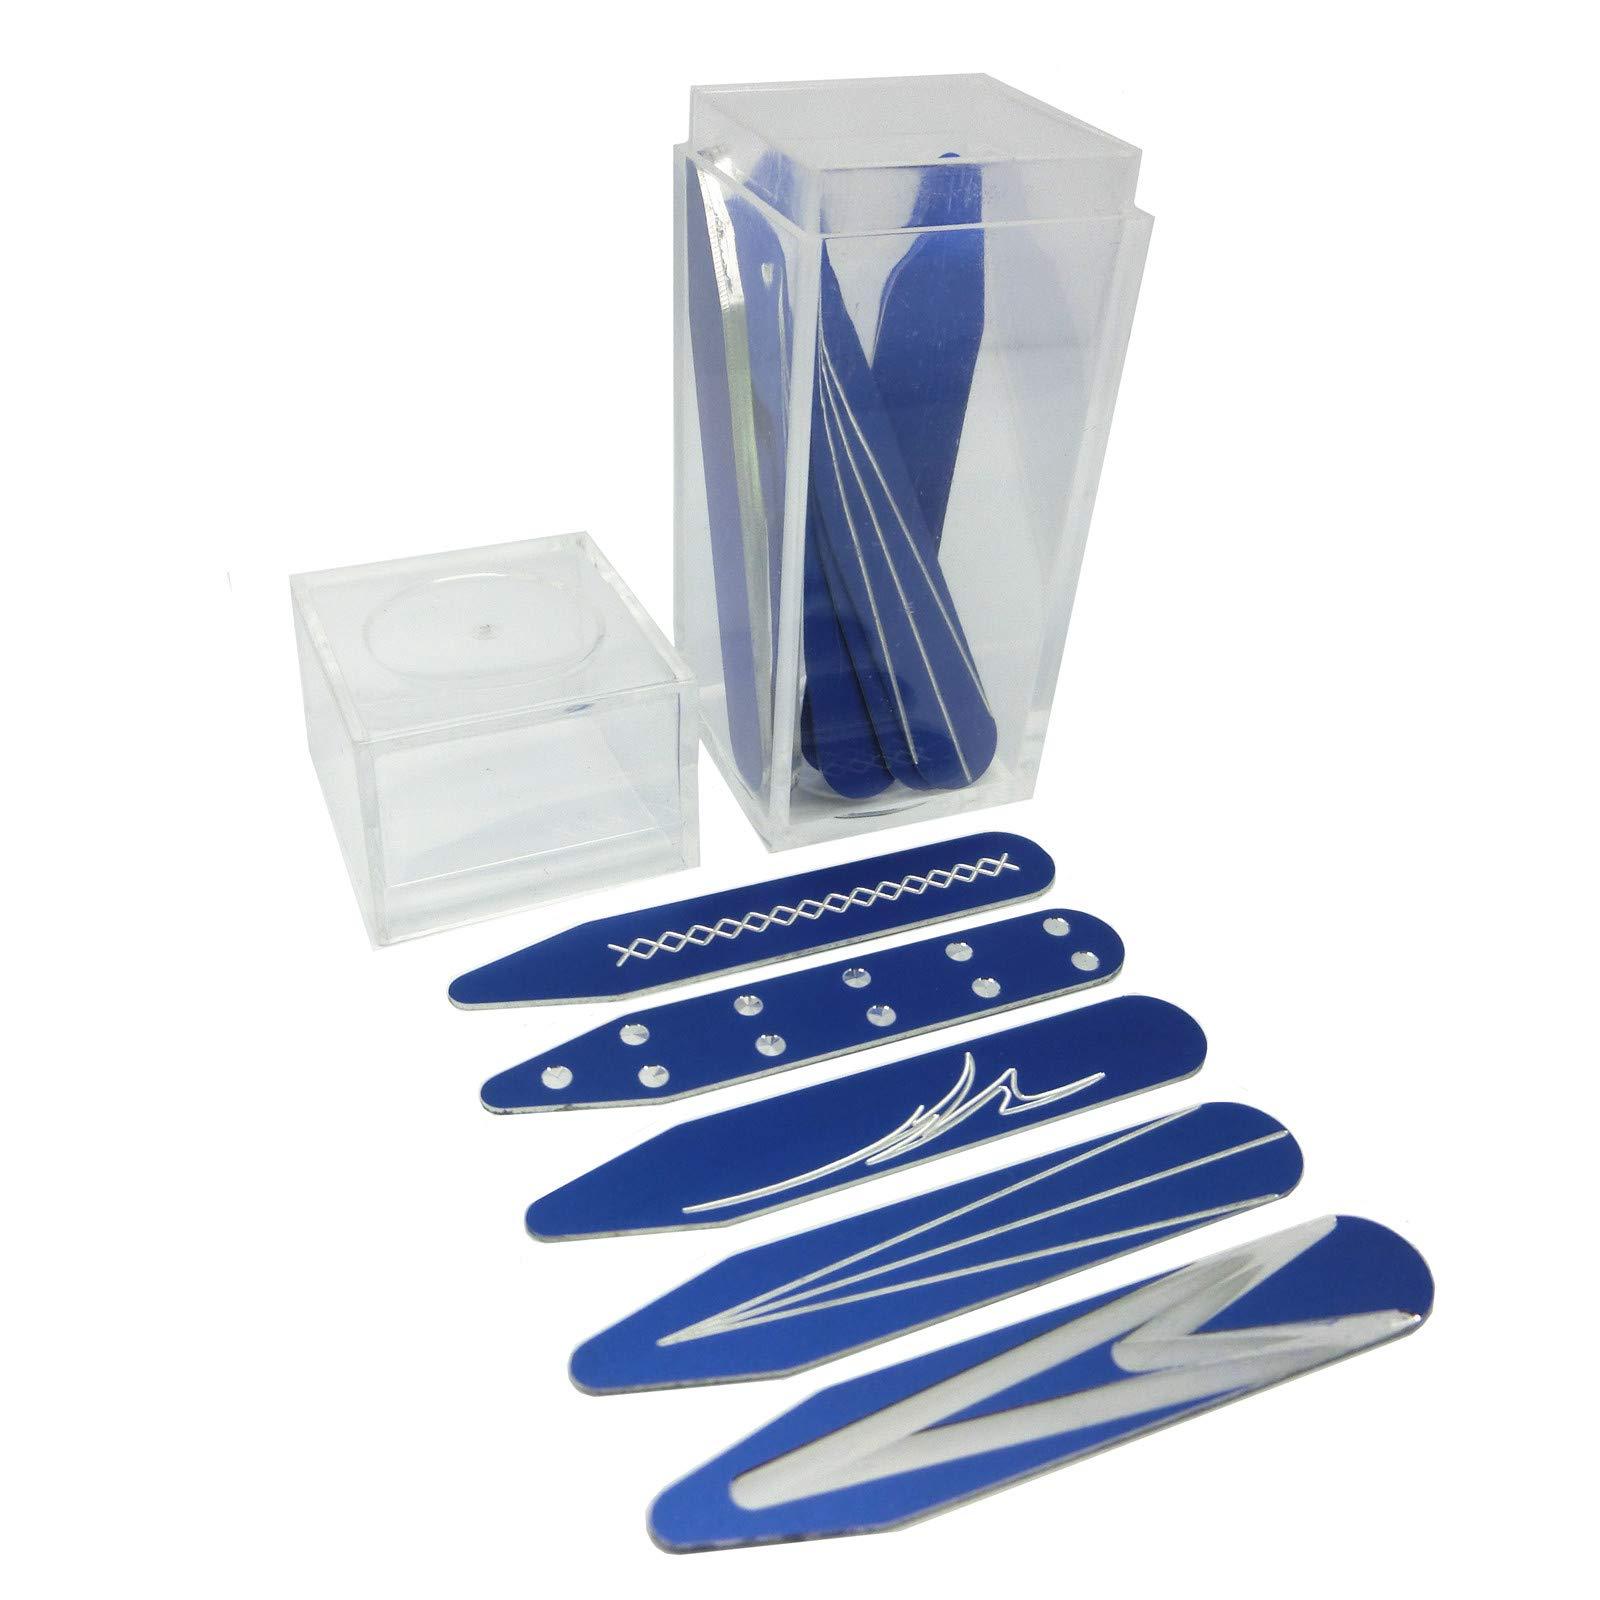 Shang Zun 10 Pcs Aluminum Metal Collar Stays in Clear Box, Blue